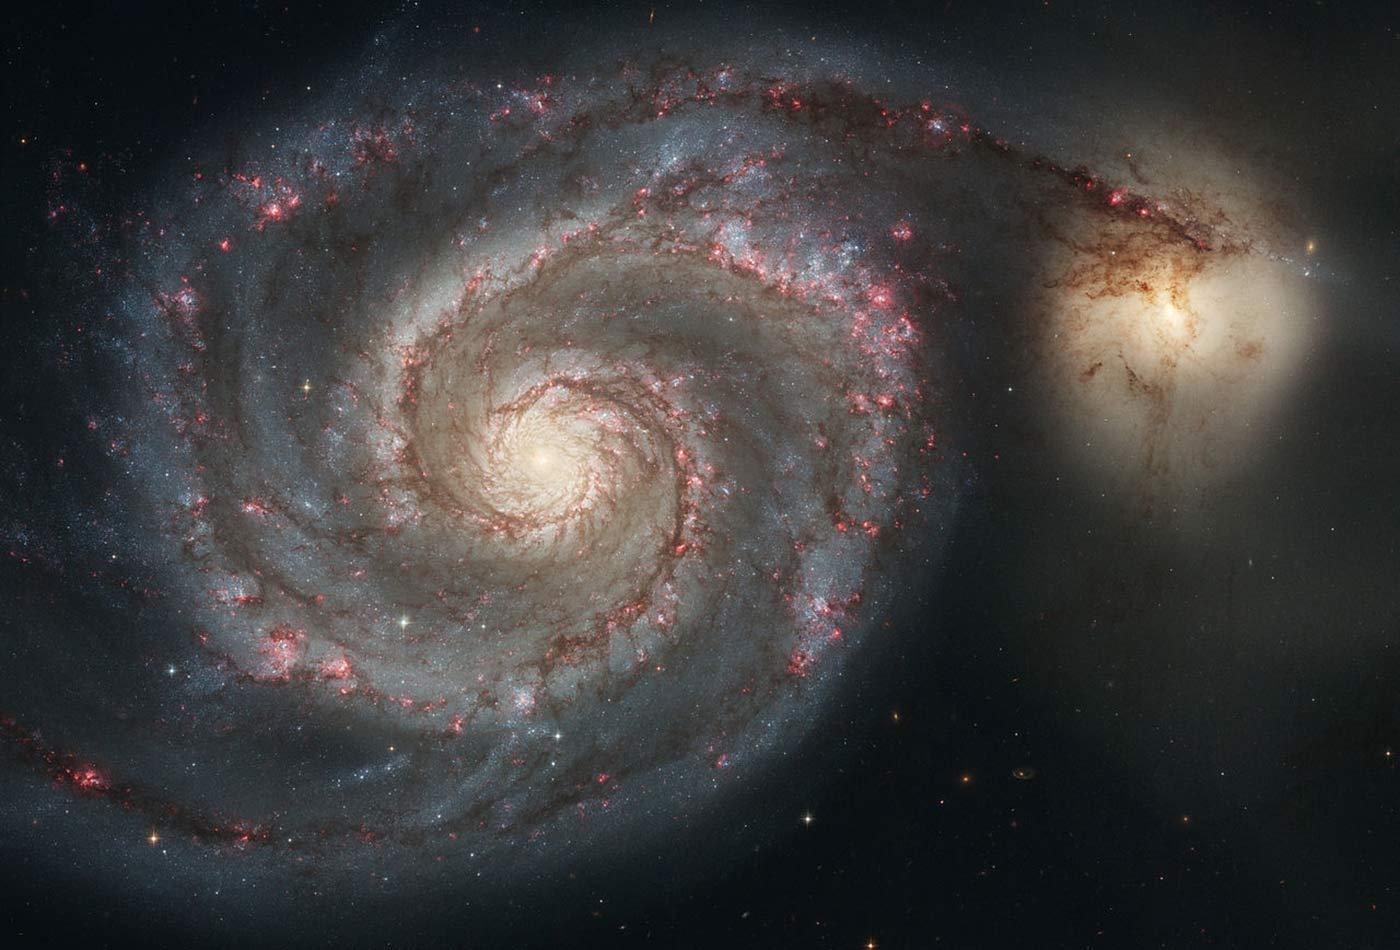 The Whirlpool Galaxy (Spiral Galaxy M51, NGC 5194).